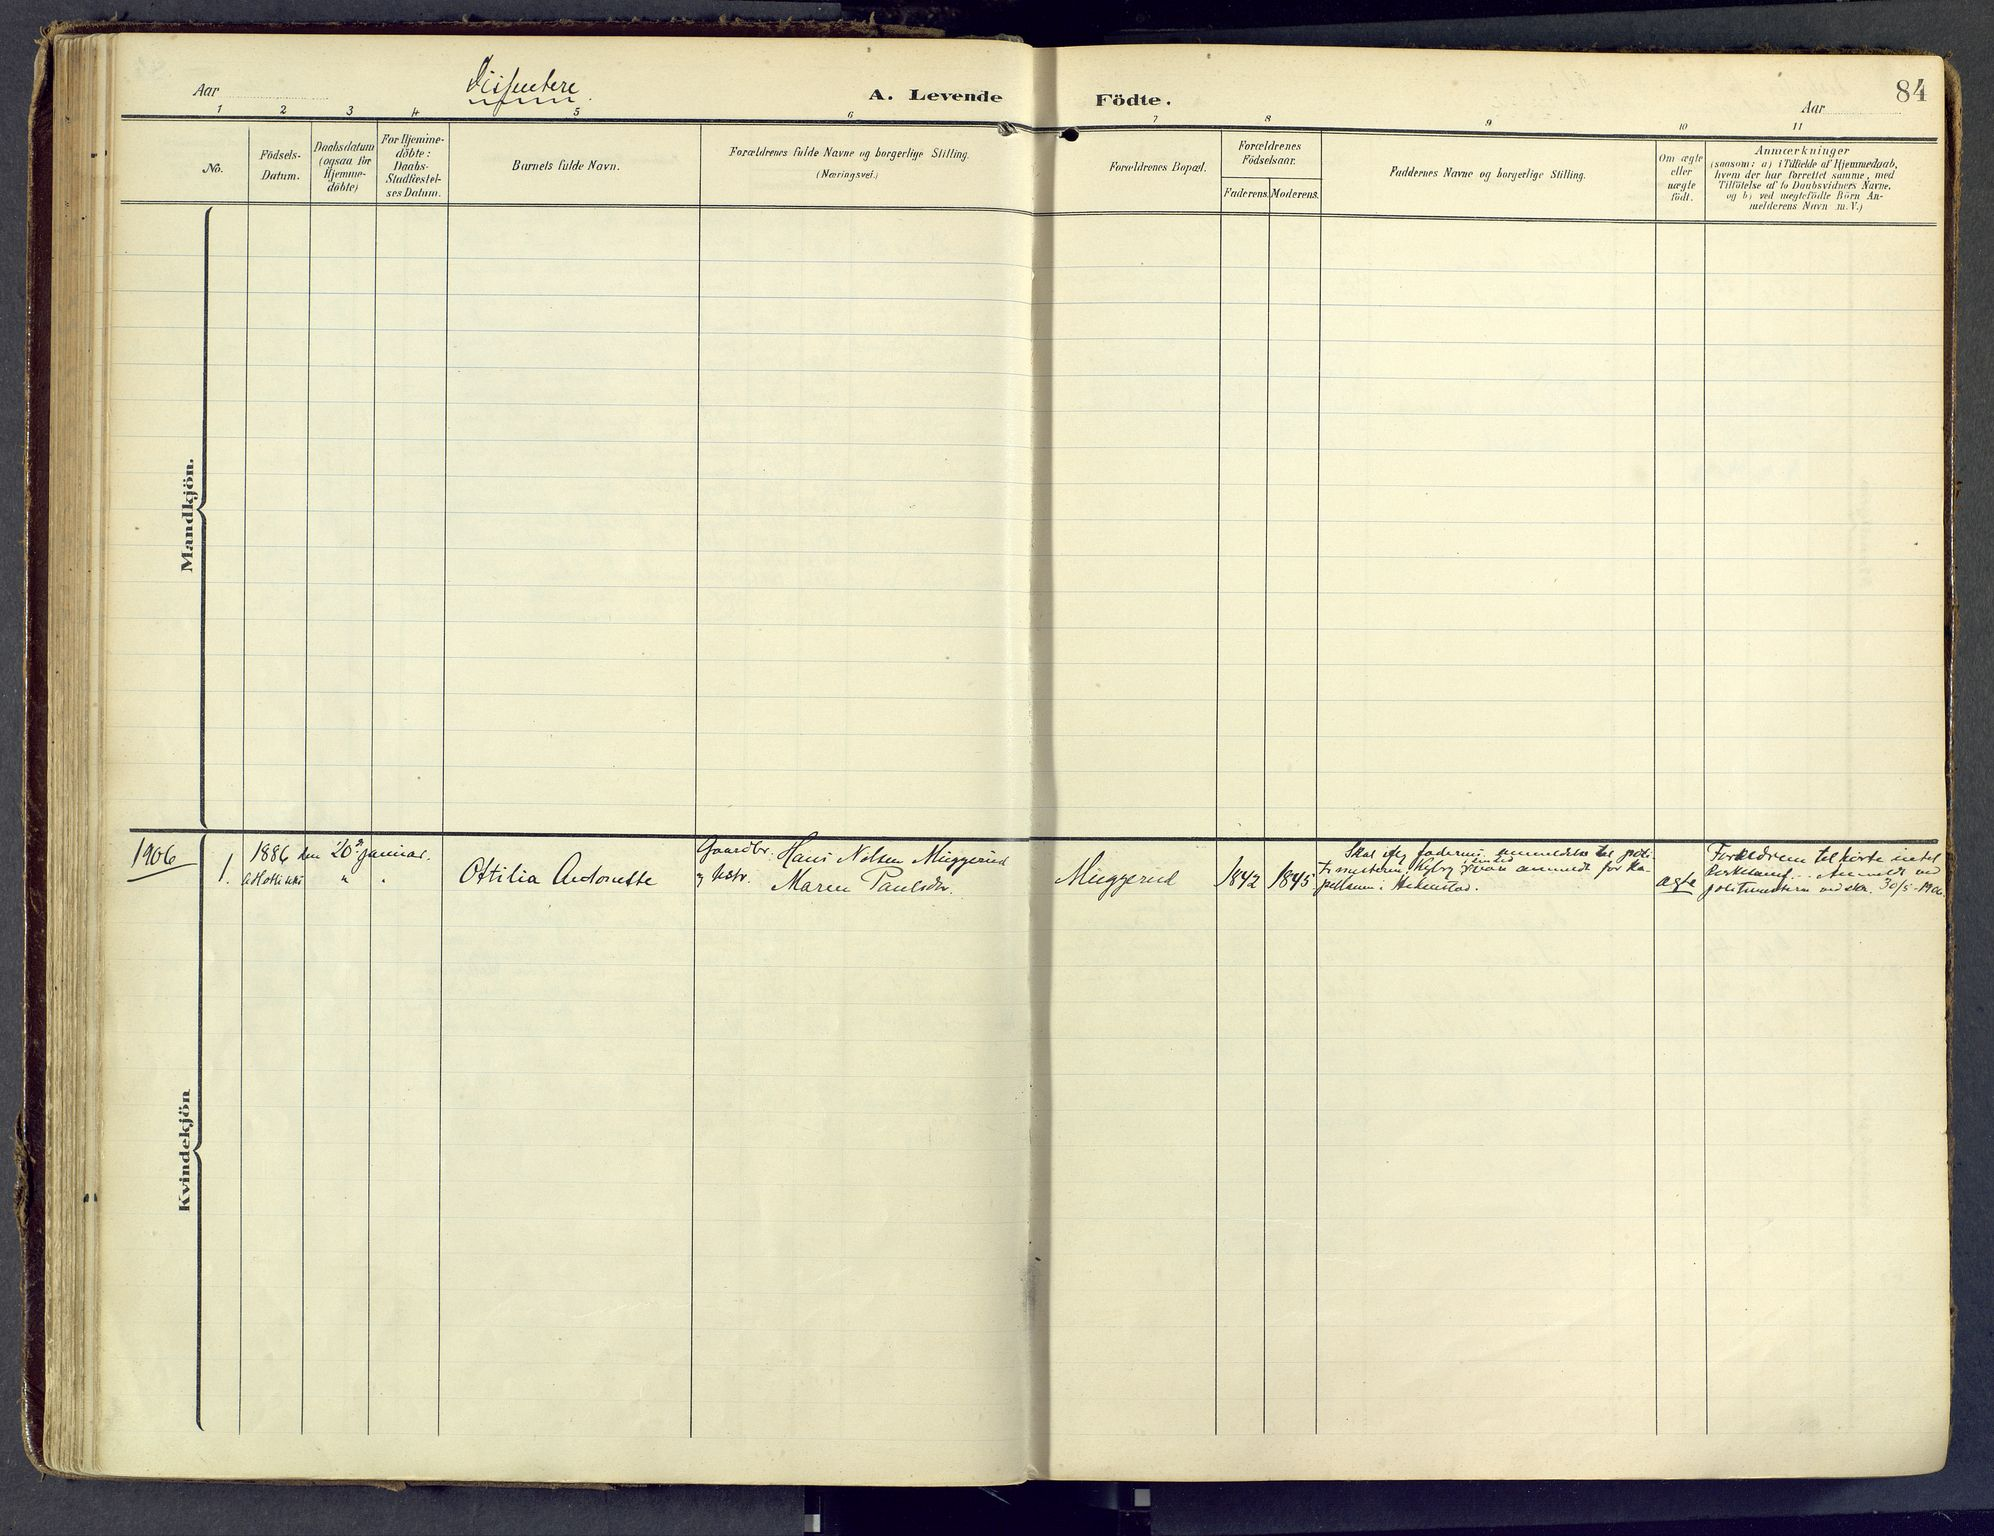 SAKO, Sandsvær kirkebøker, F/Fd/L0002: Ministerialbok nr. IV 2, 1906-1943, s. 84